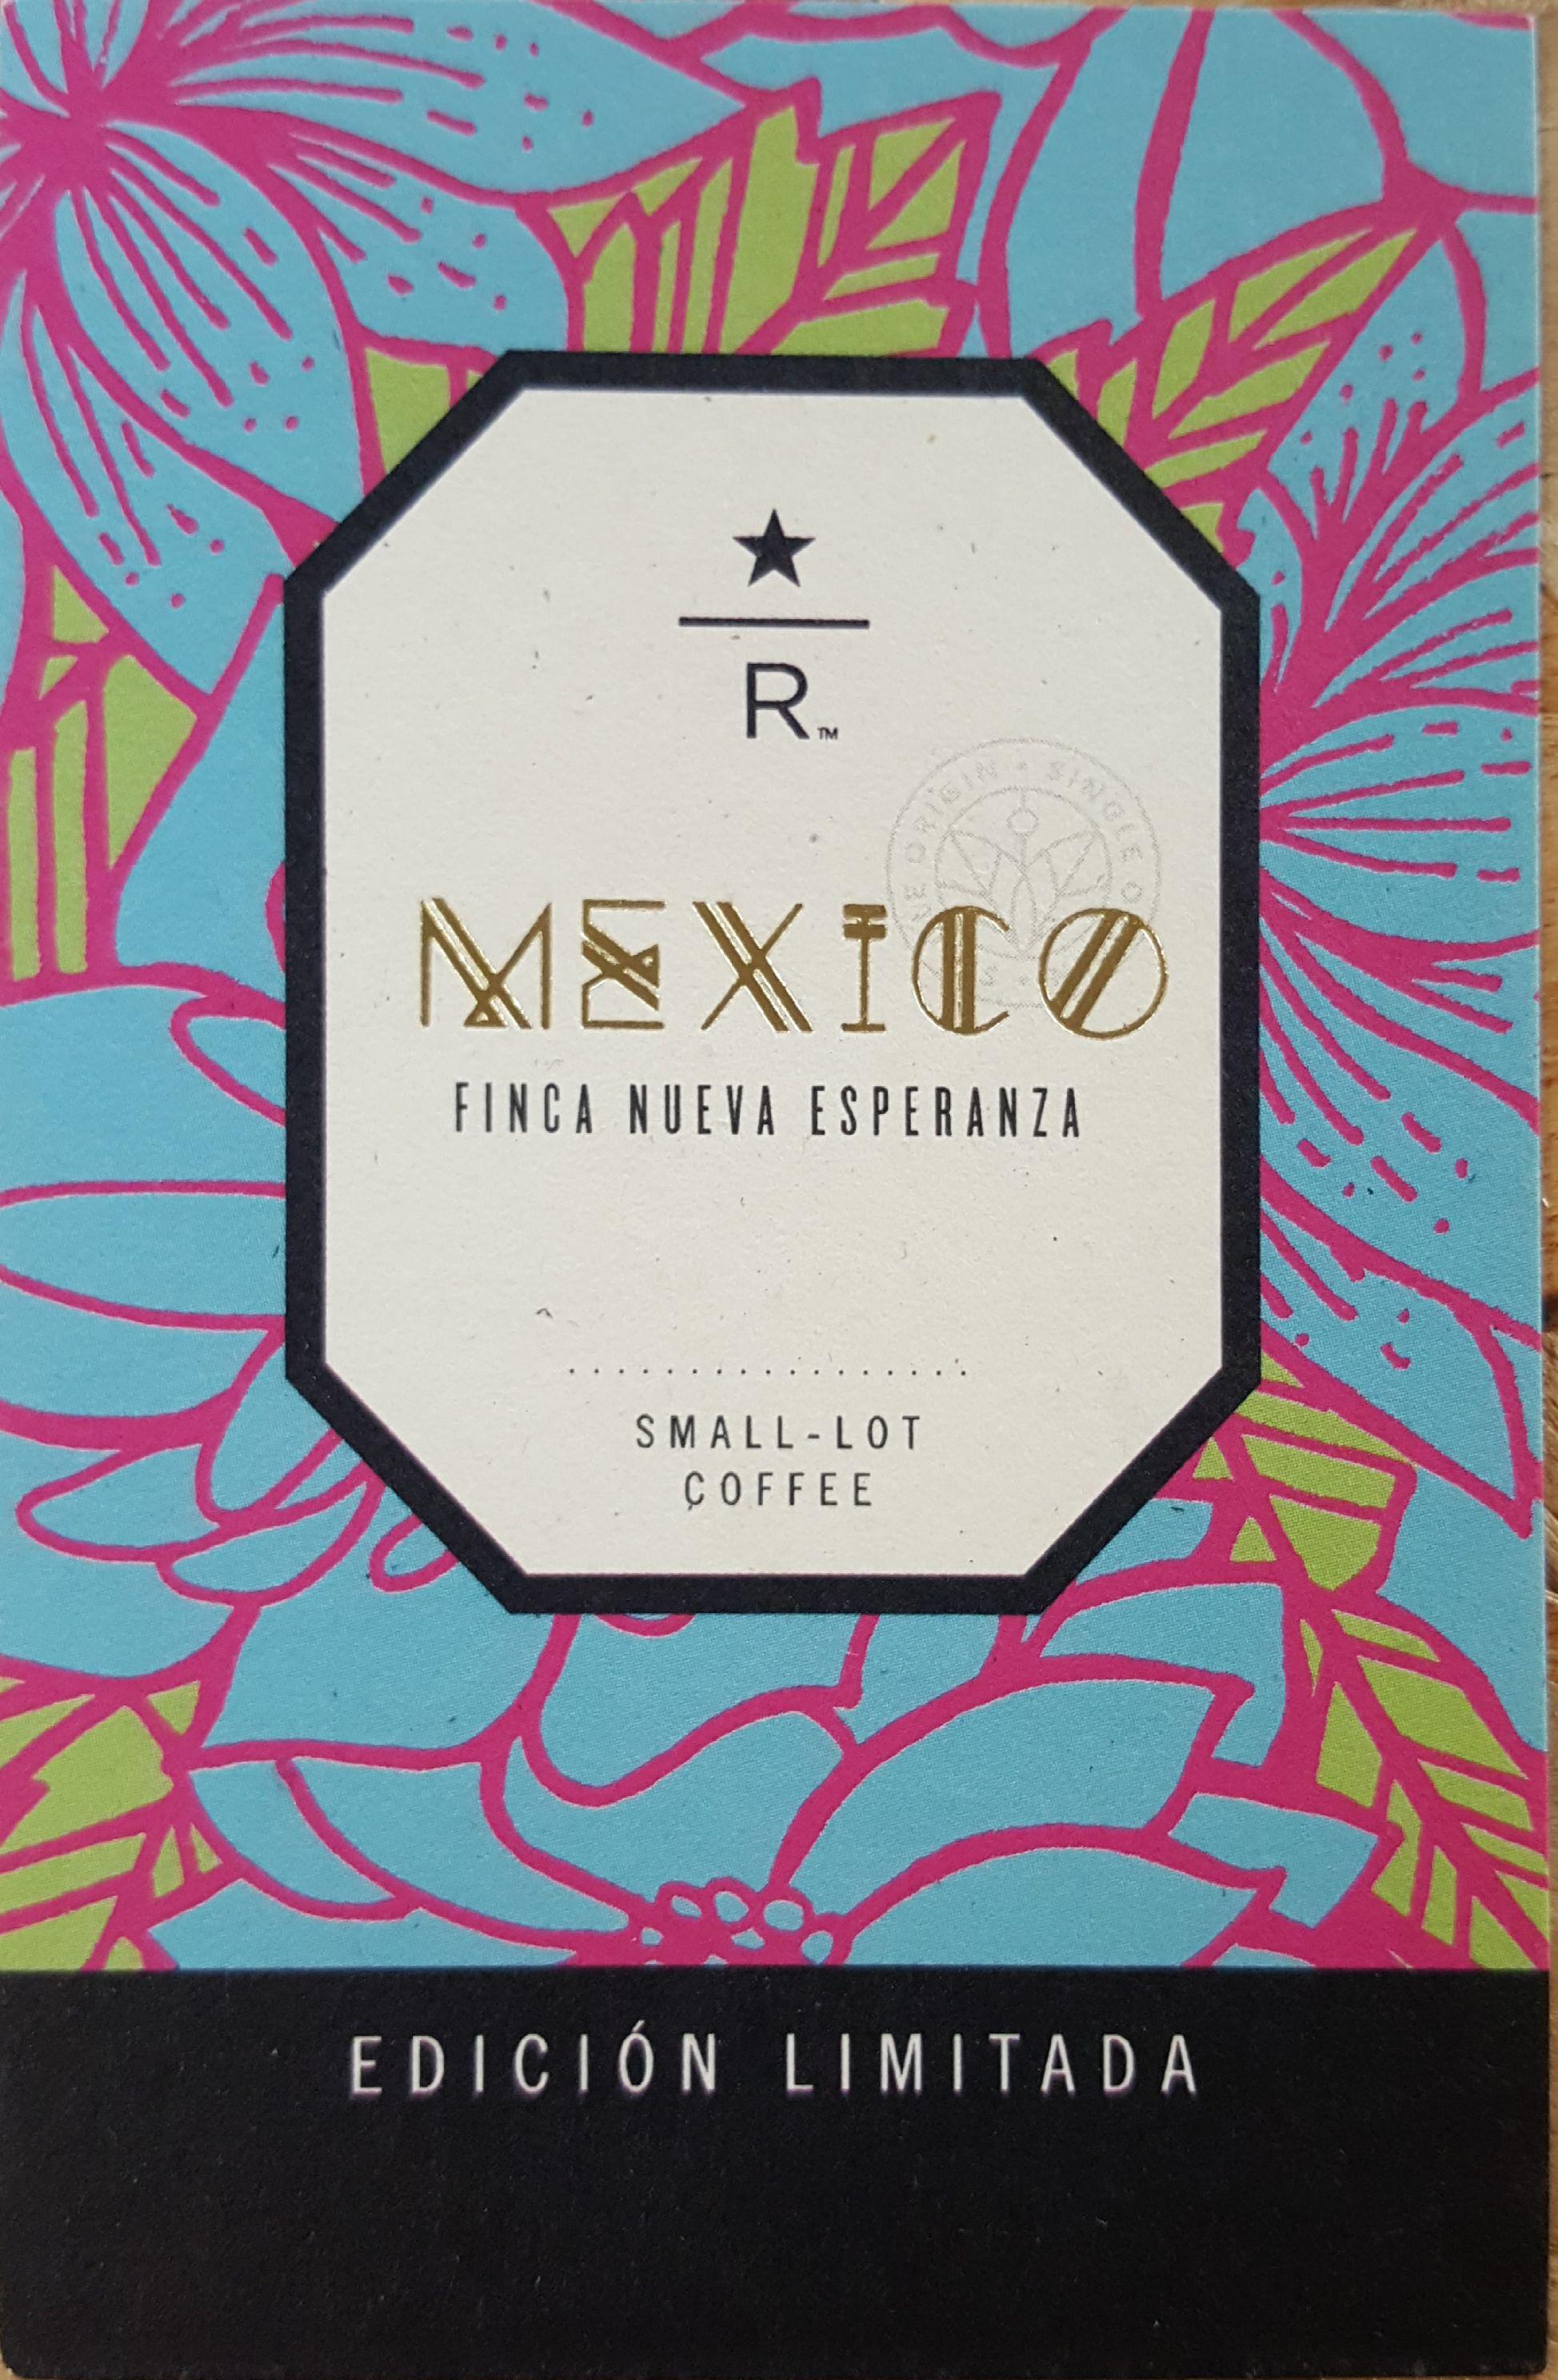 New Doc 127_1 Card for Mexico Finca Nueva Esperanza.jpg